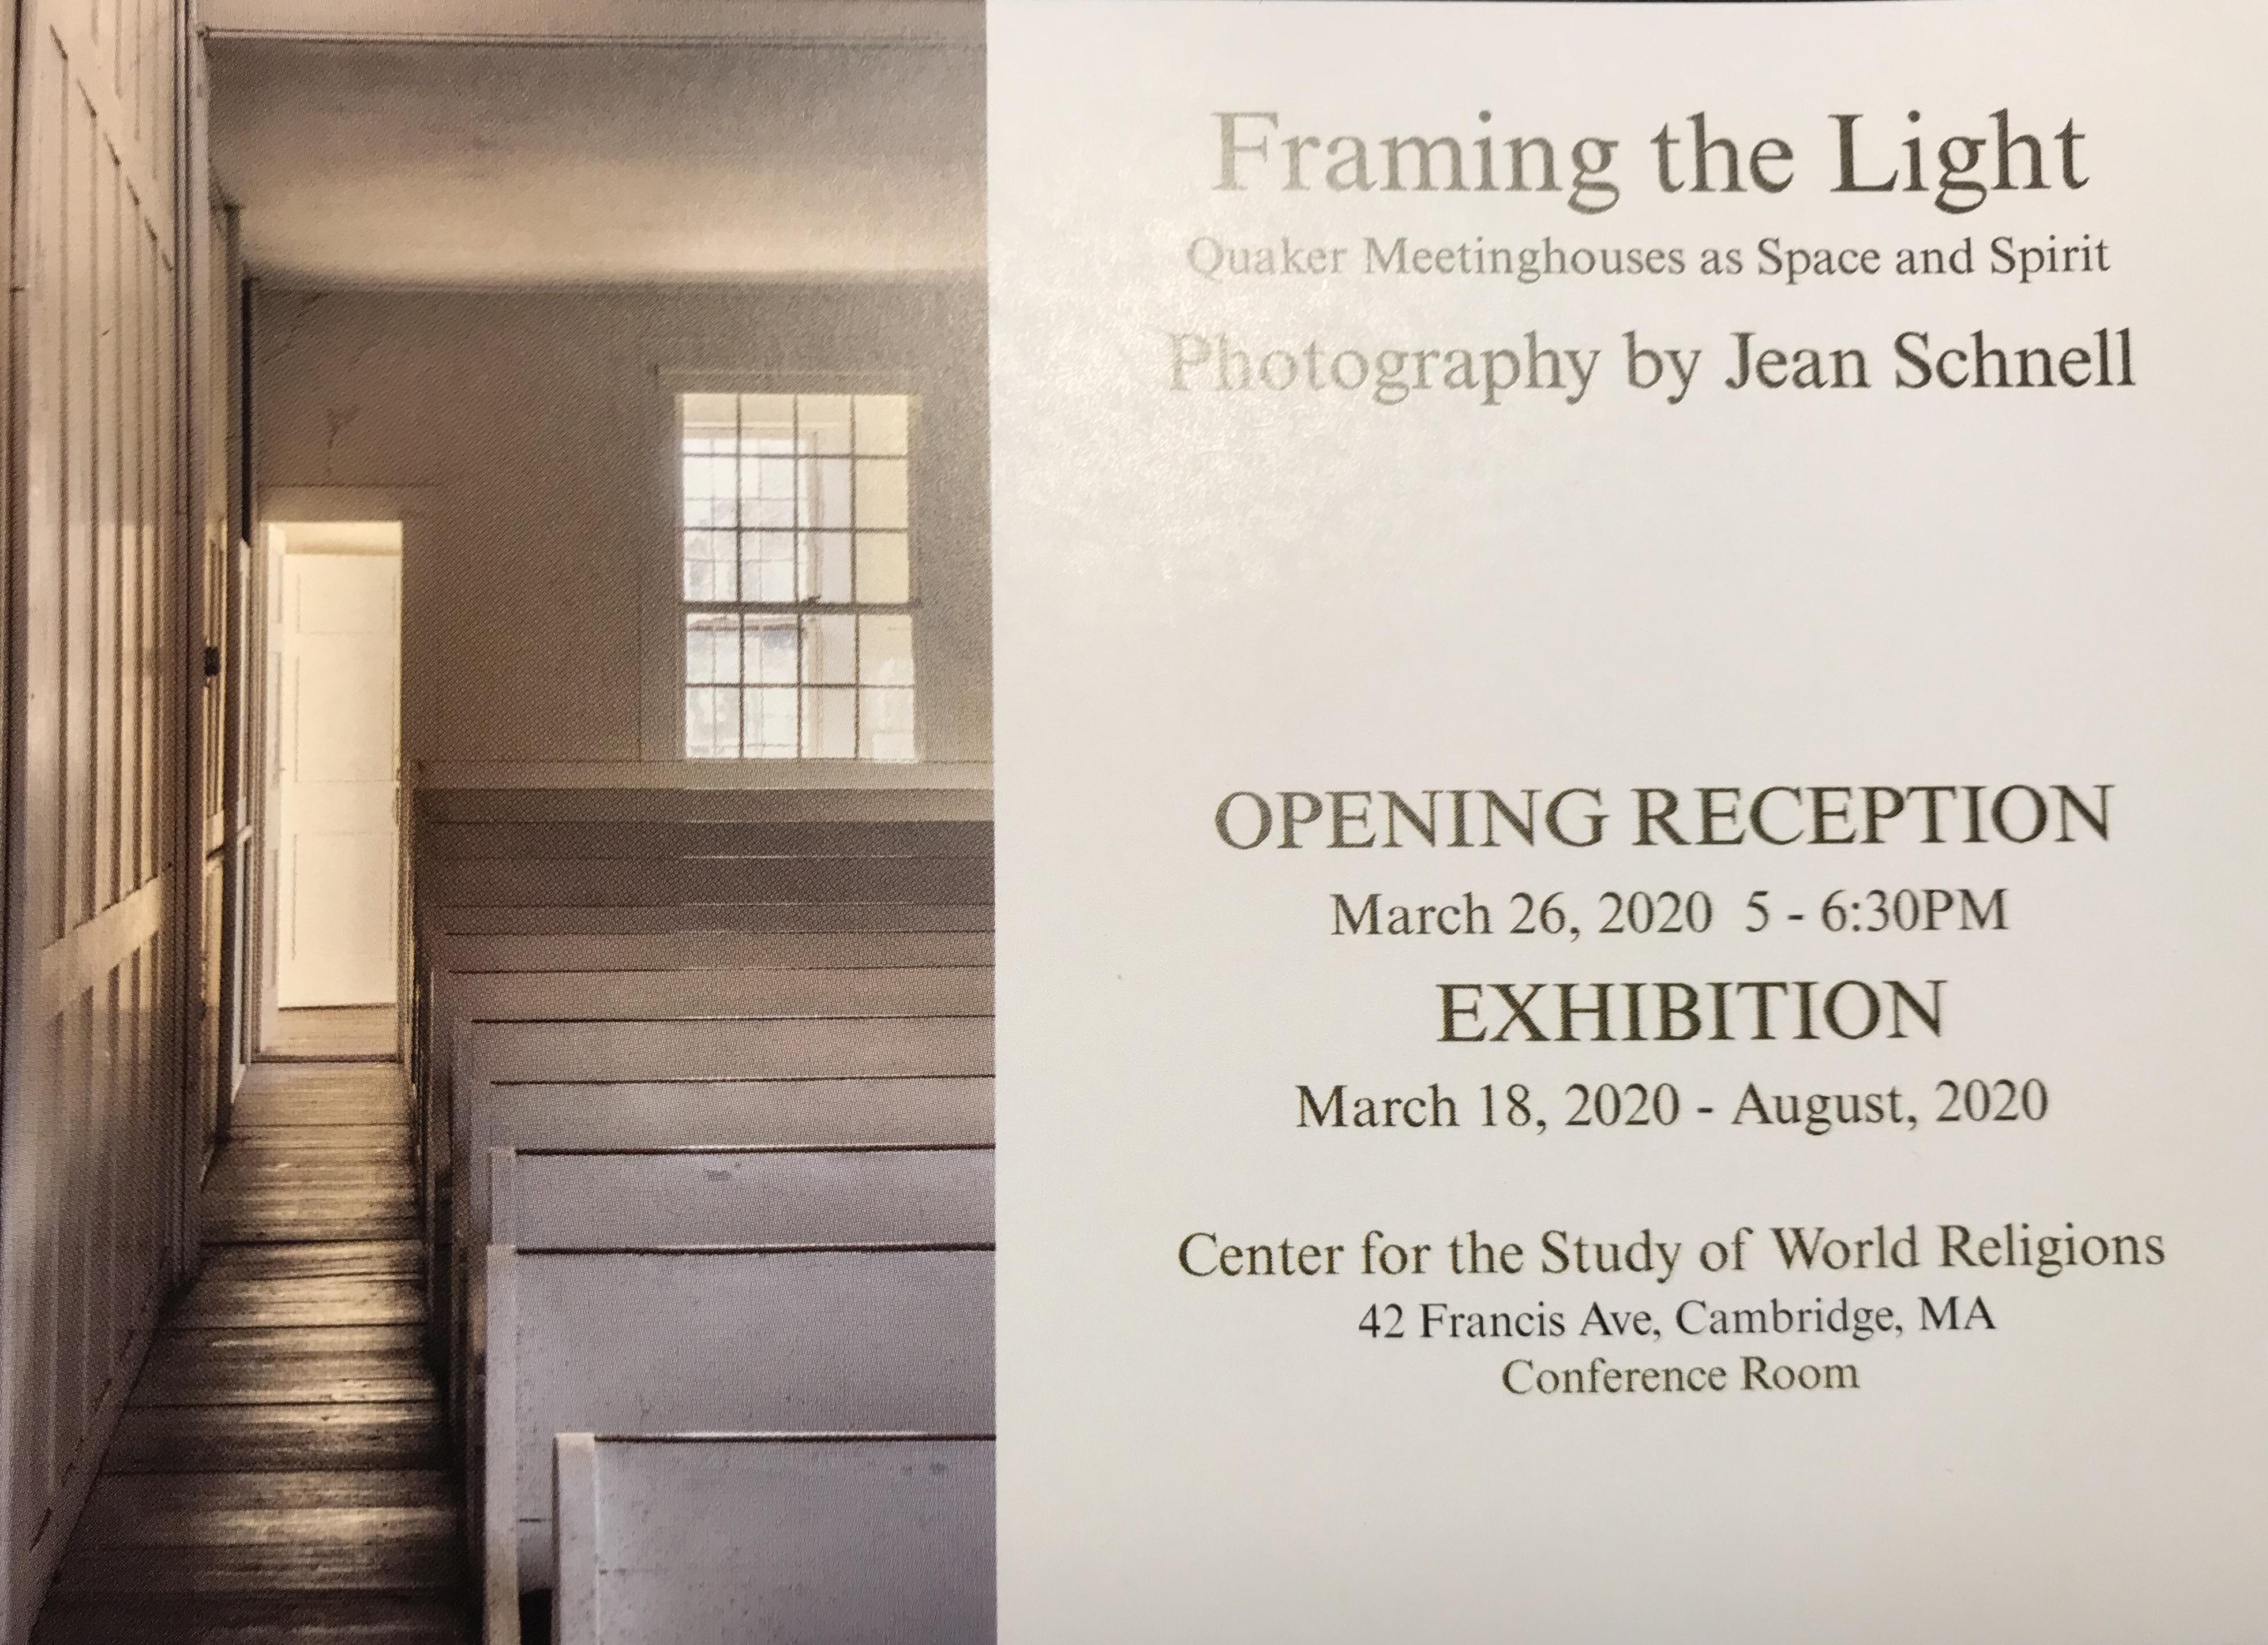 Jean Schnell, Exhibition invitation